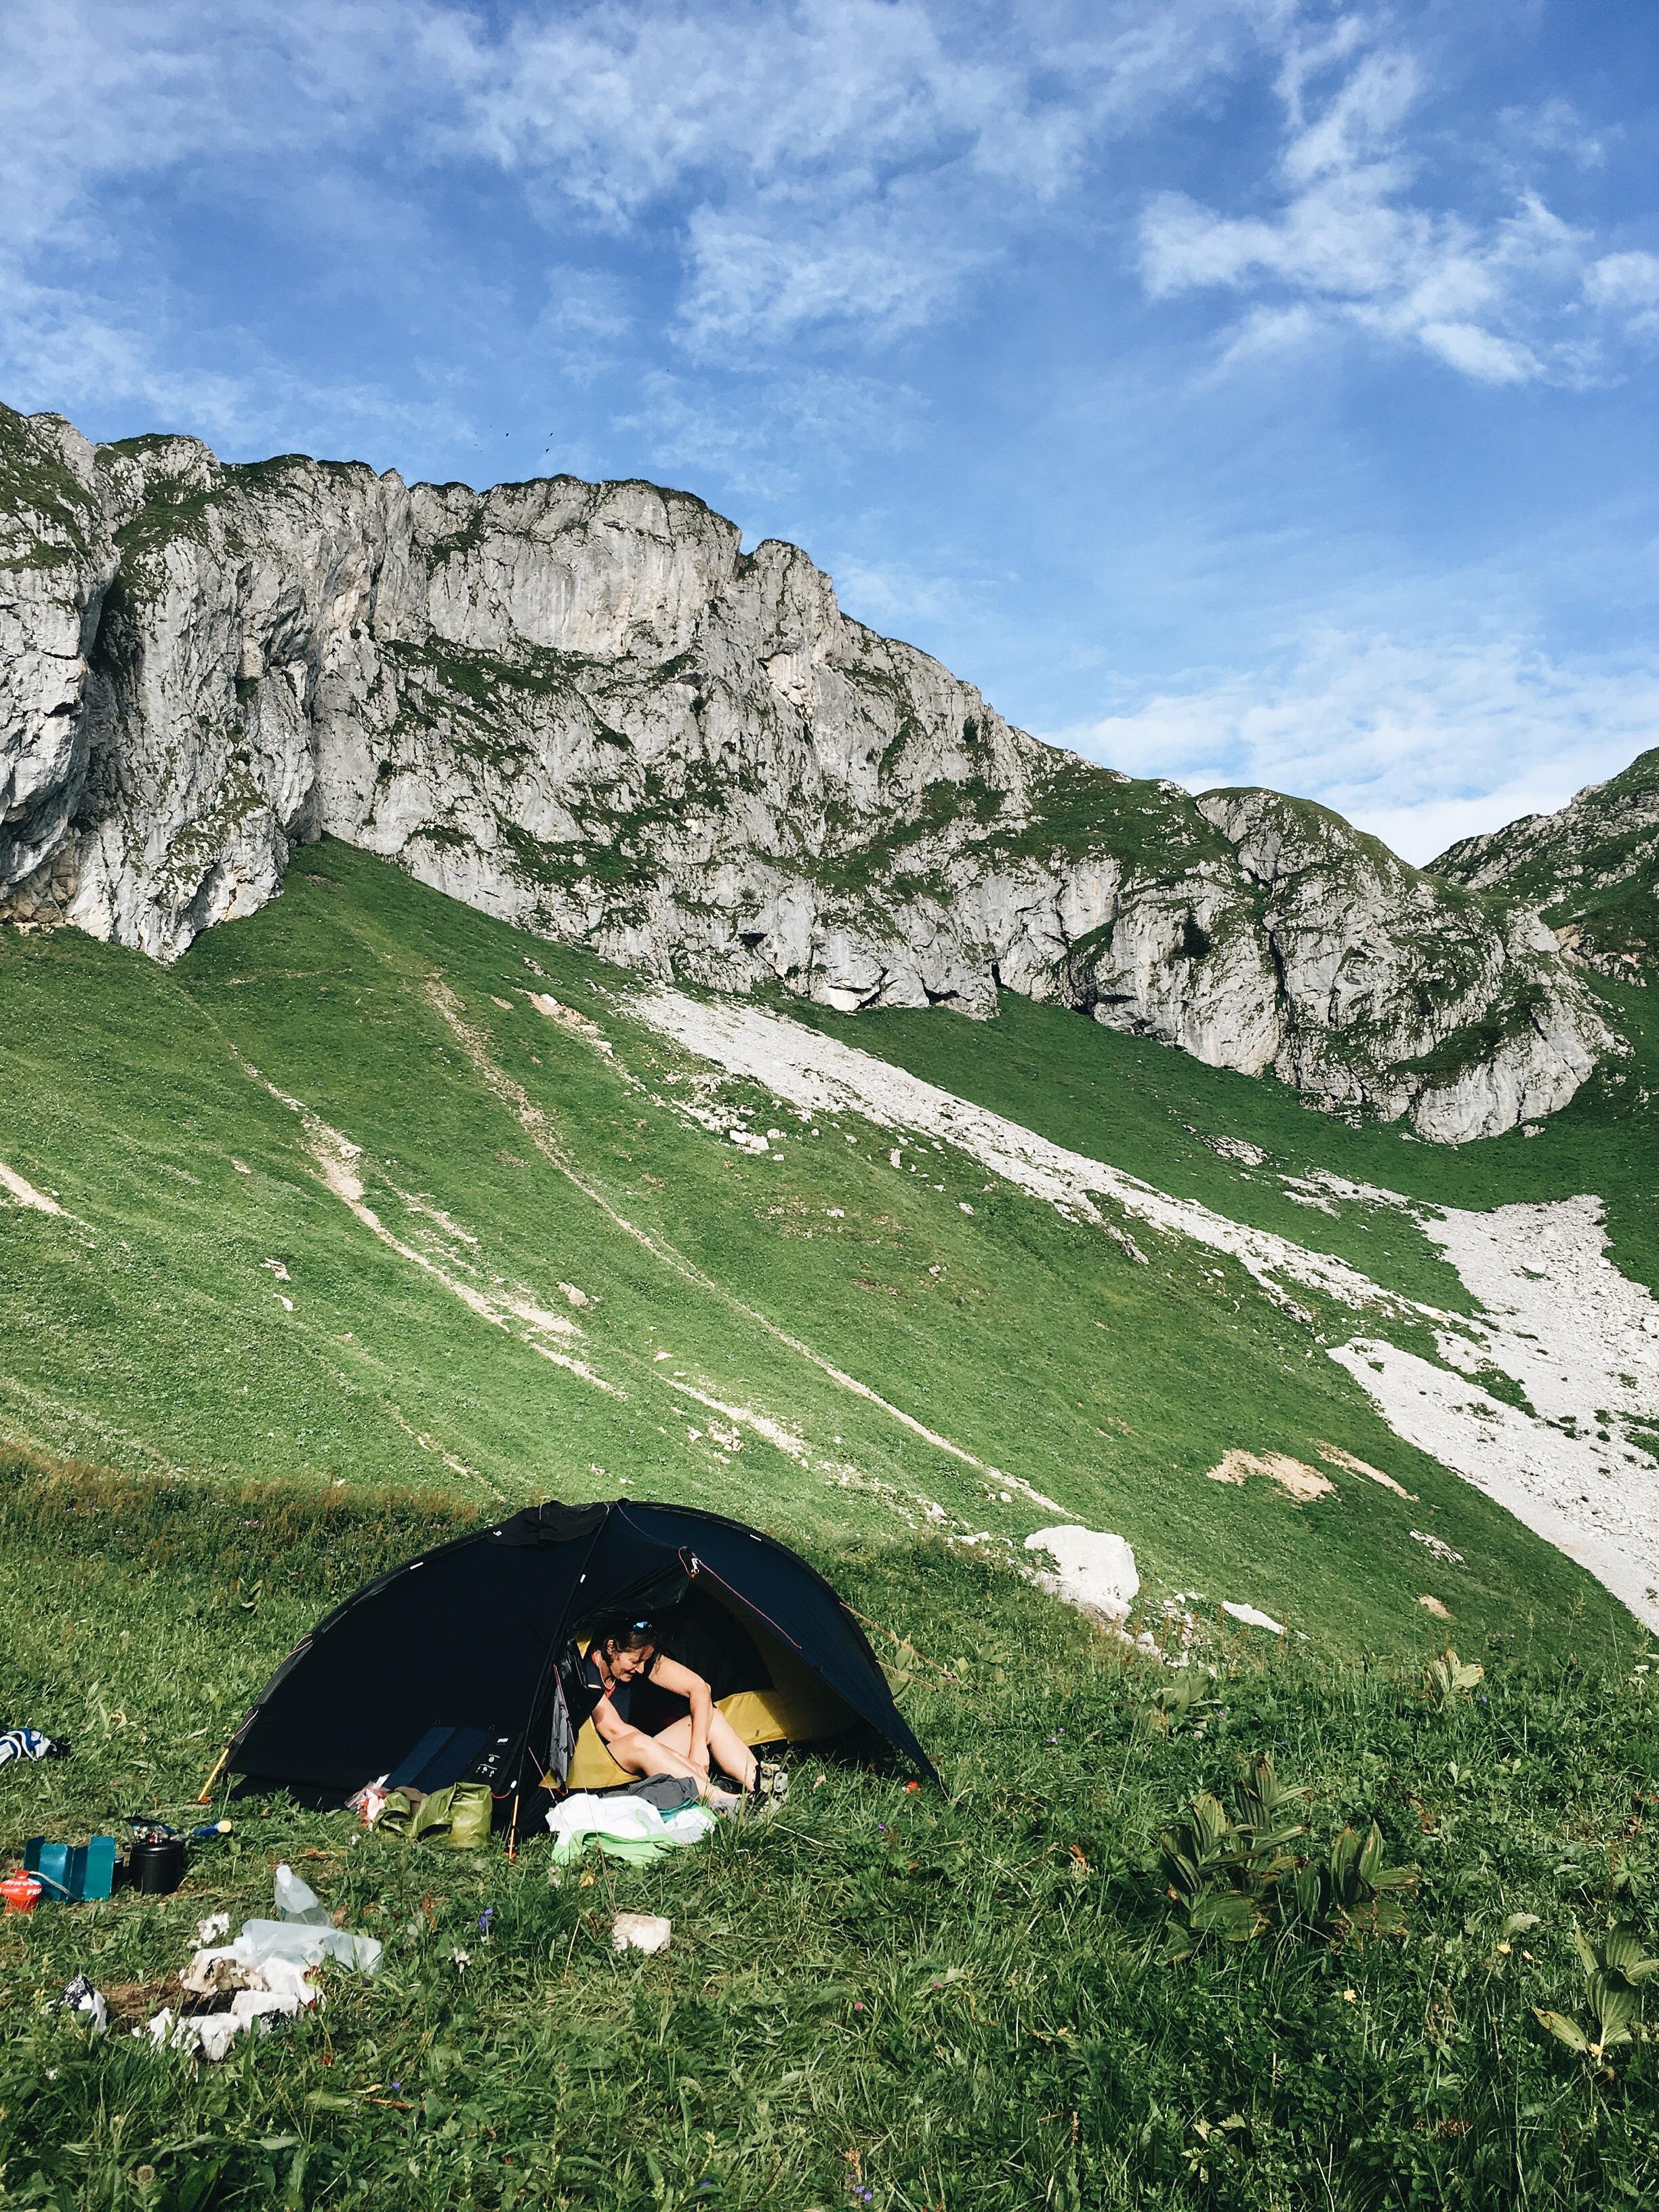 Wild camping over looking Lac De Darbon.